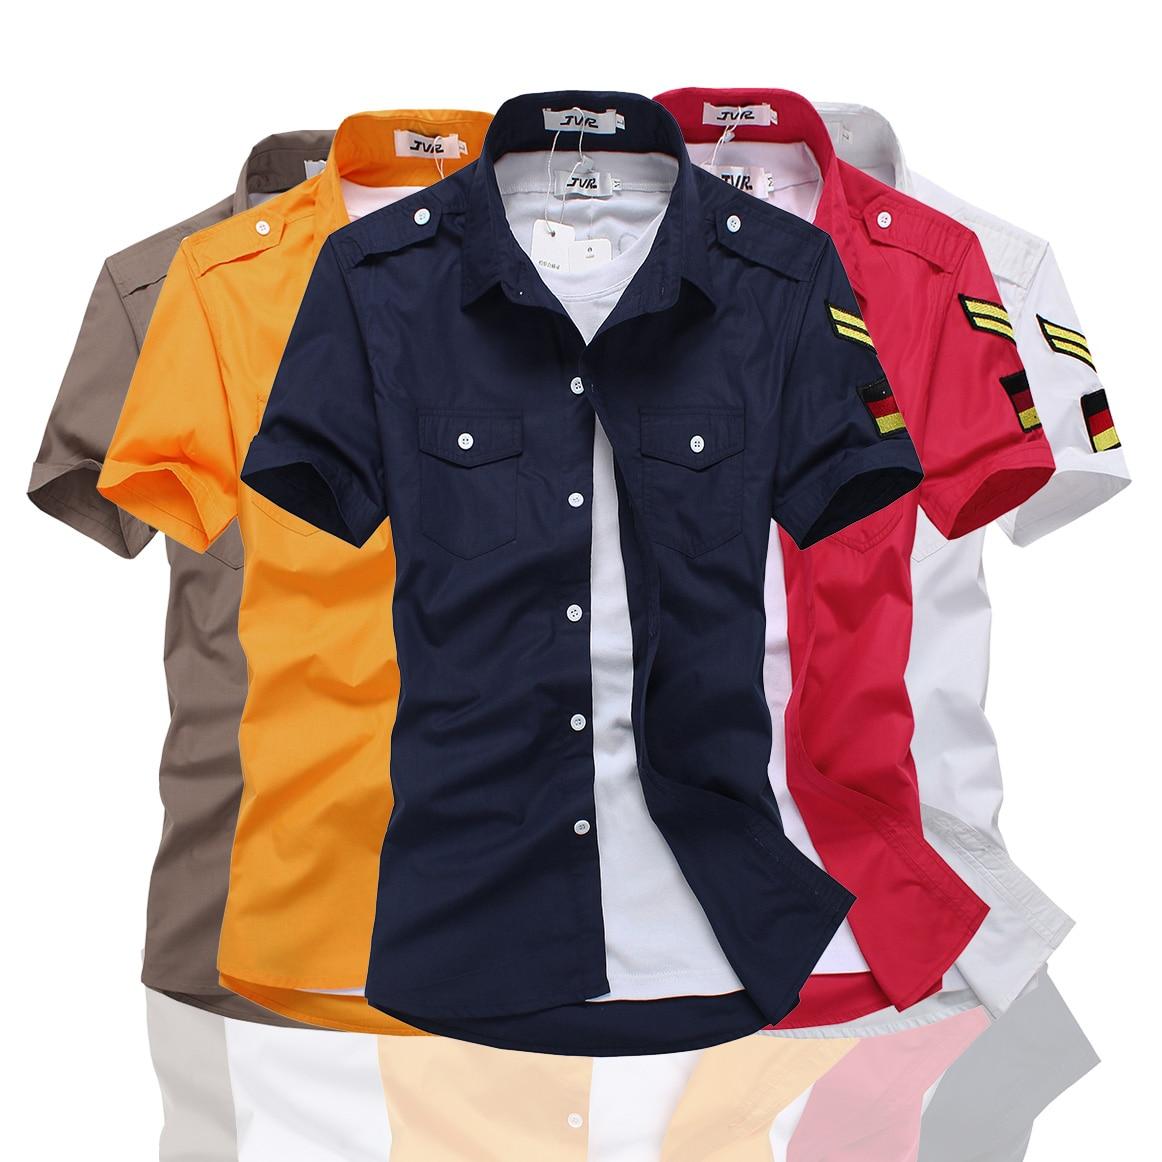 2013 Summer Men 39 S Male Short Sleeve Shirt Commando